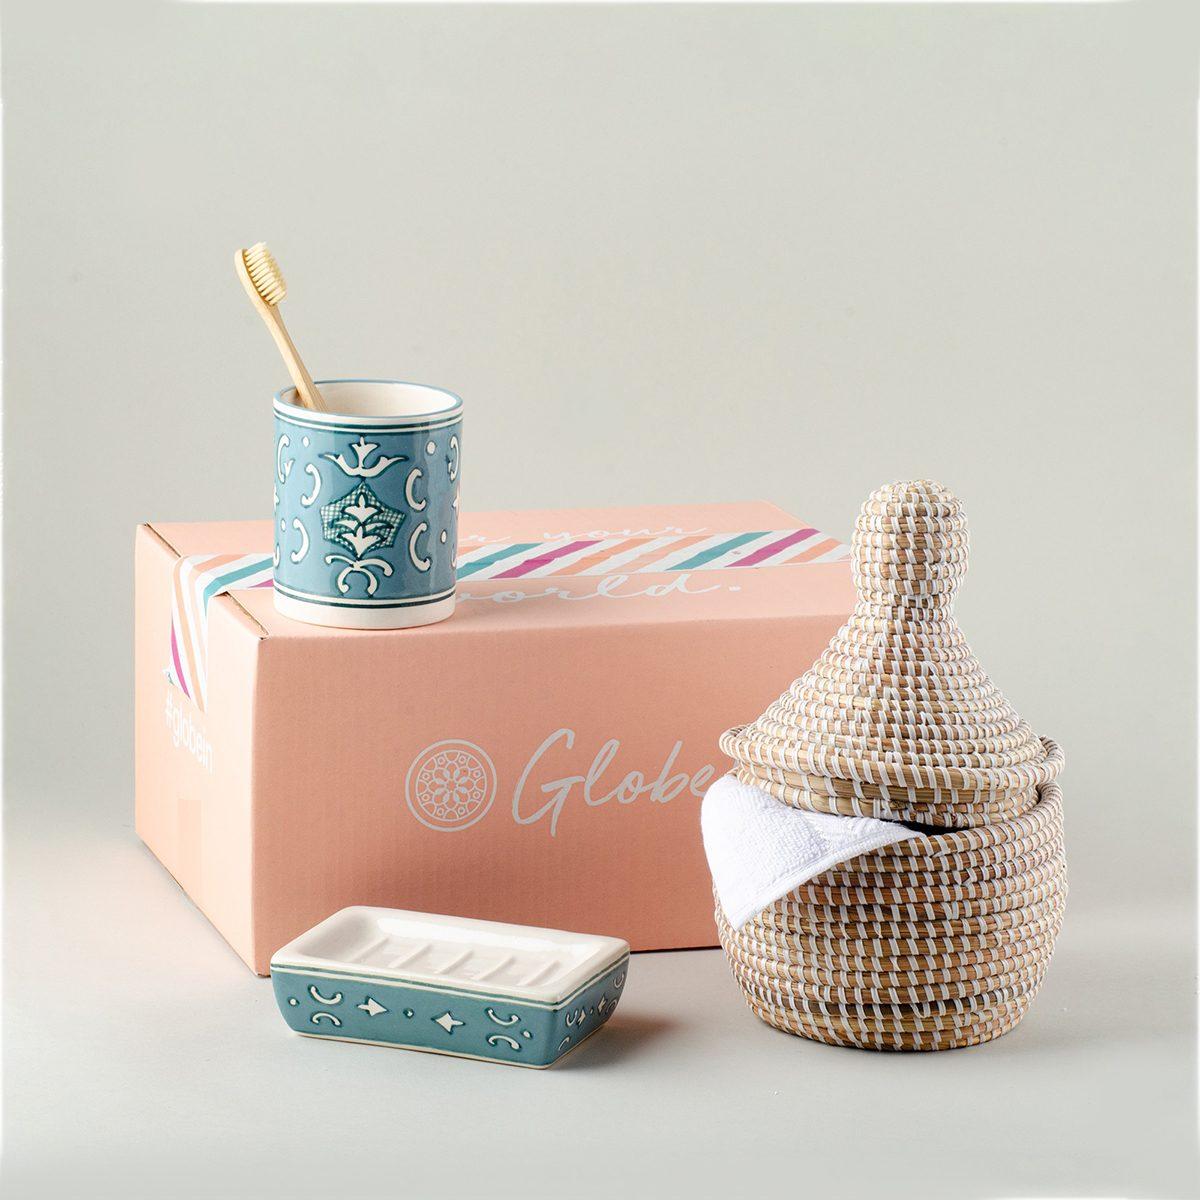 Globein Box home decor subscription box